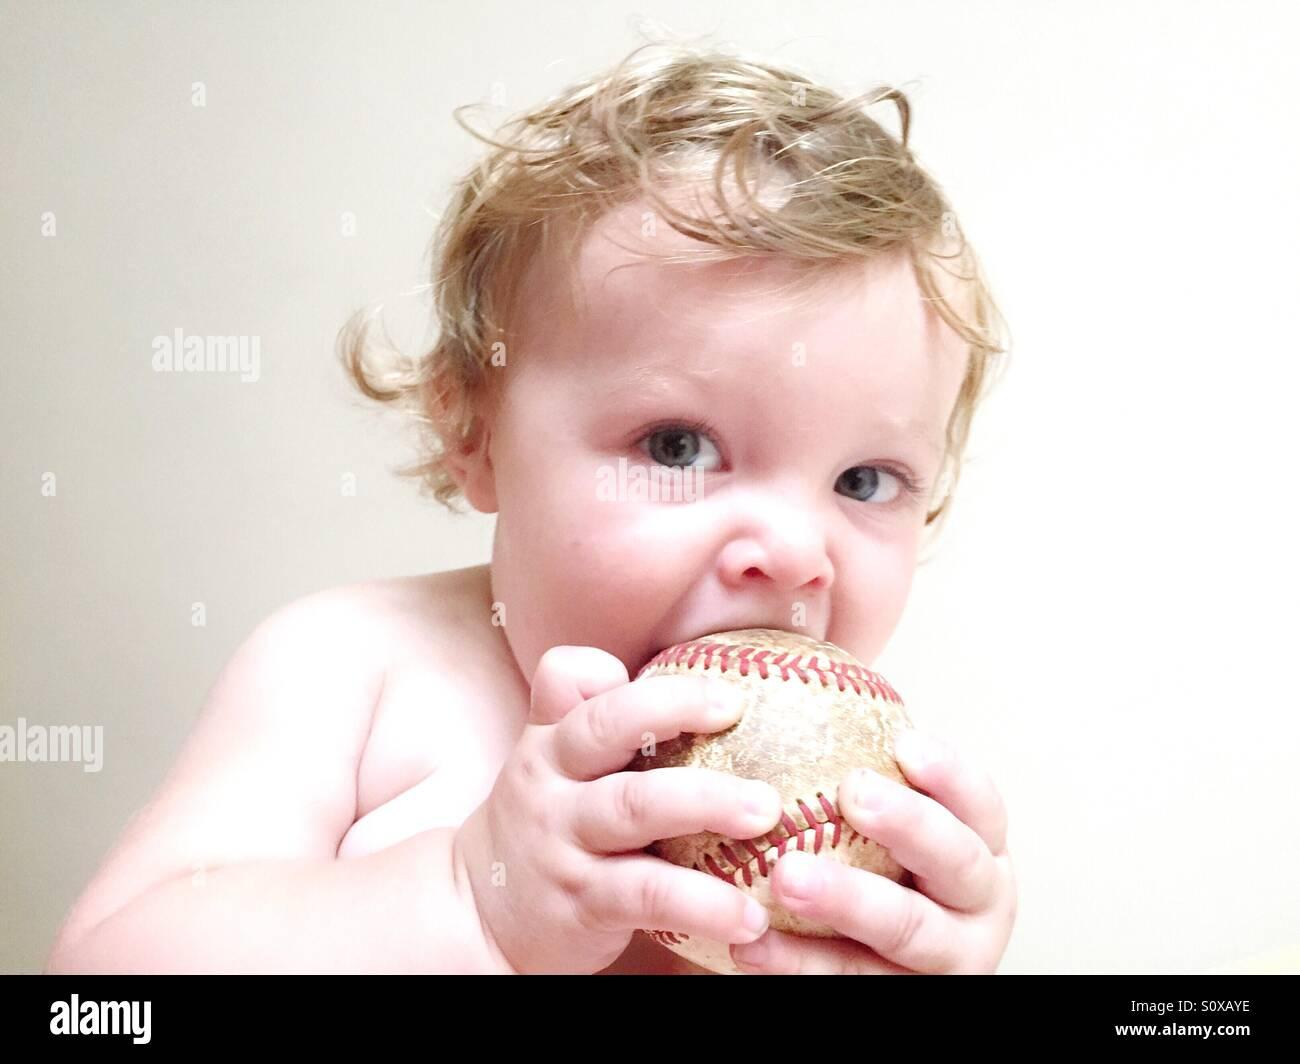 Clave alta imagen de un bebé masticar un viejo baseball Imagen De Stock